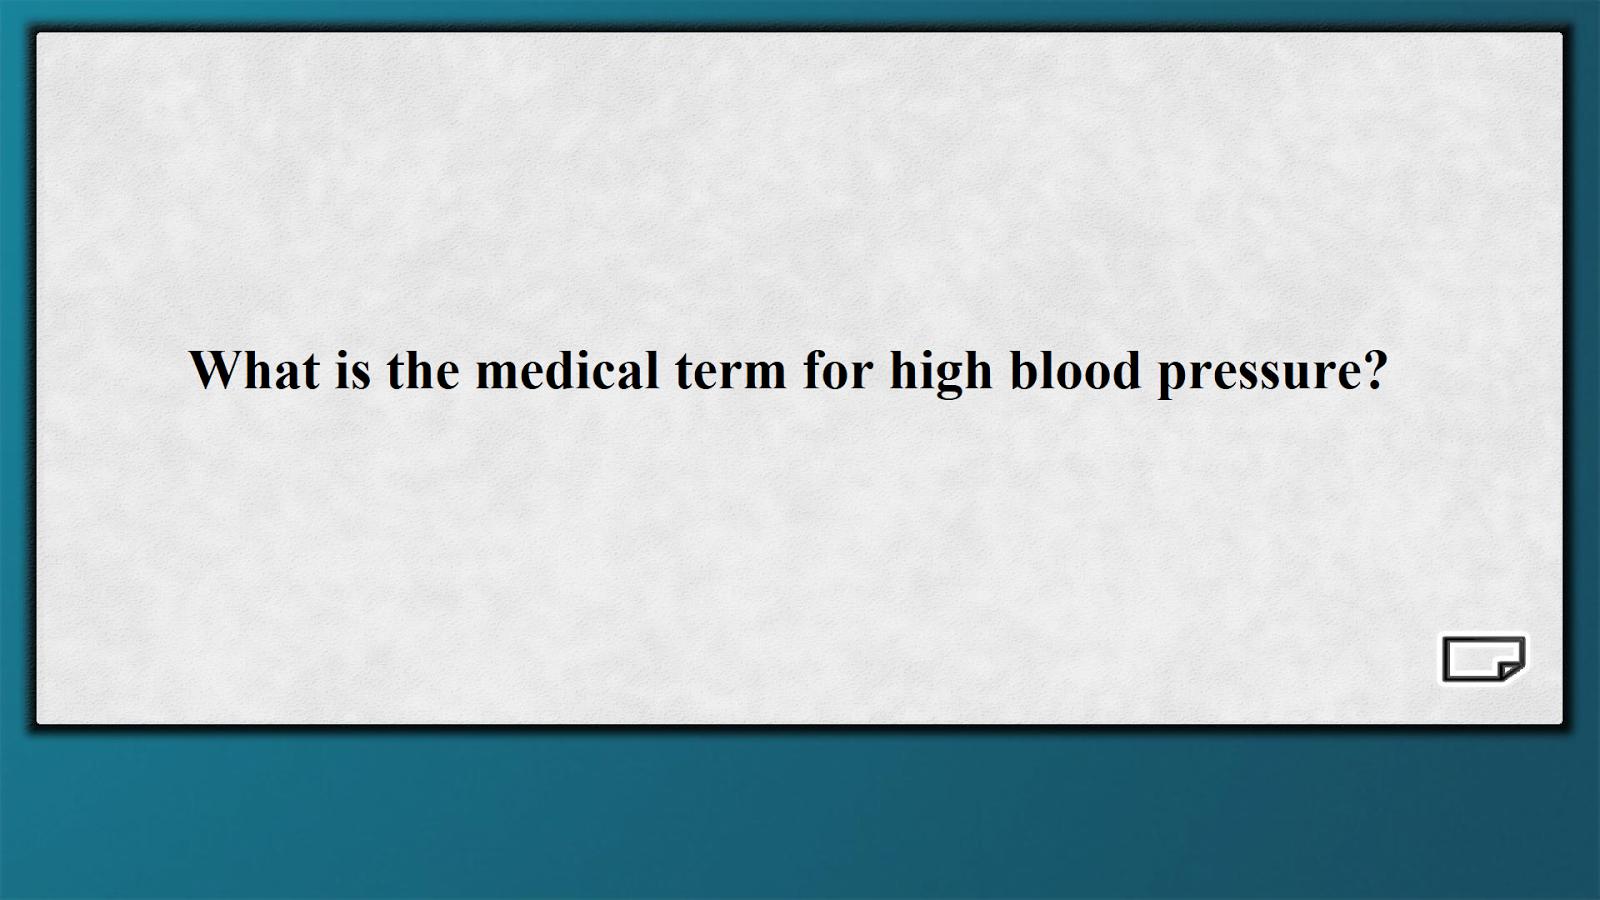 Certified nursing assistant cna practice test android apps on certified nursing assistant cna practice test screenshot xflitez Image collections